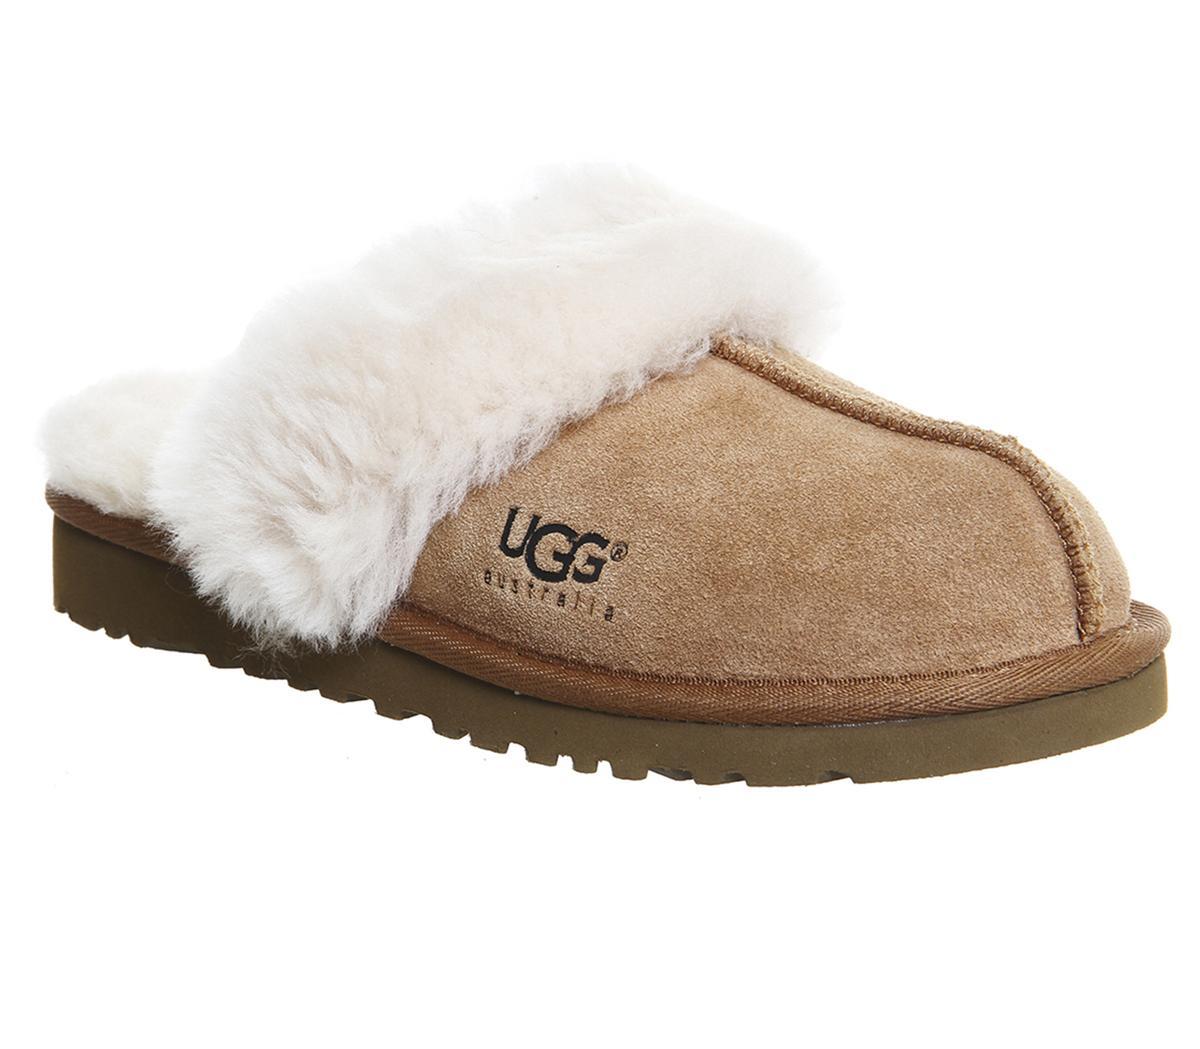 Cozy K Slippers